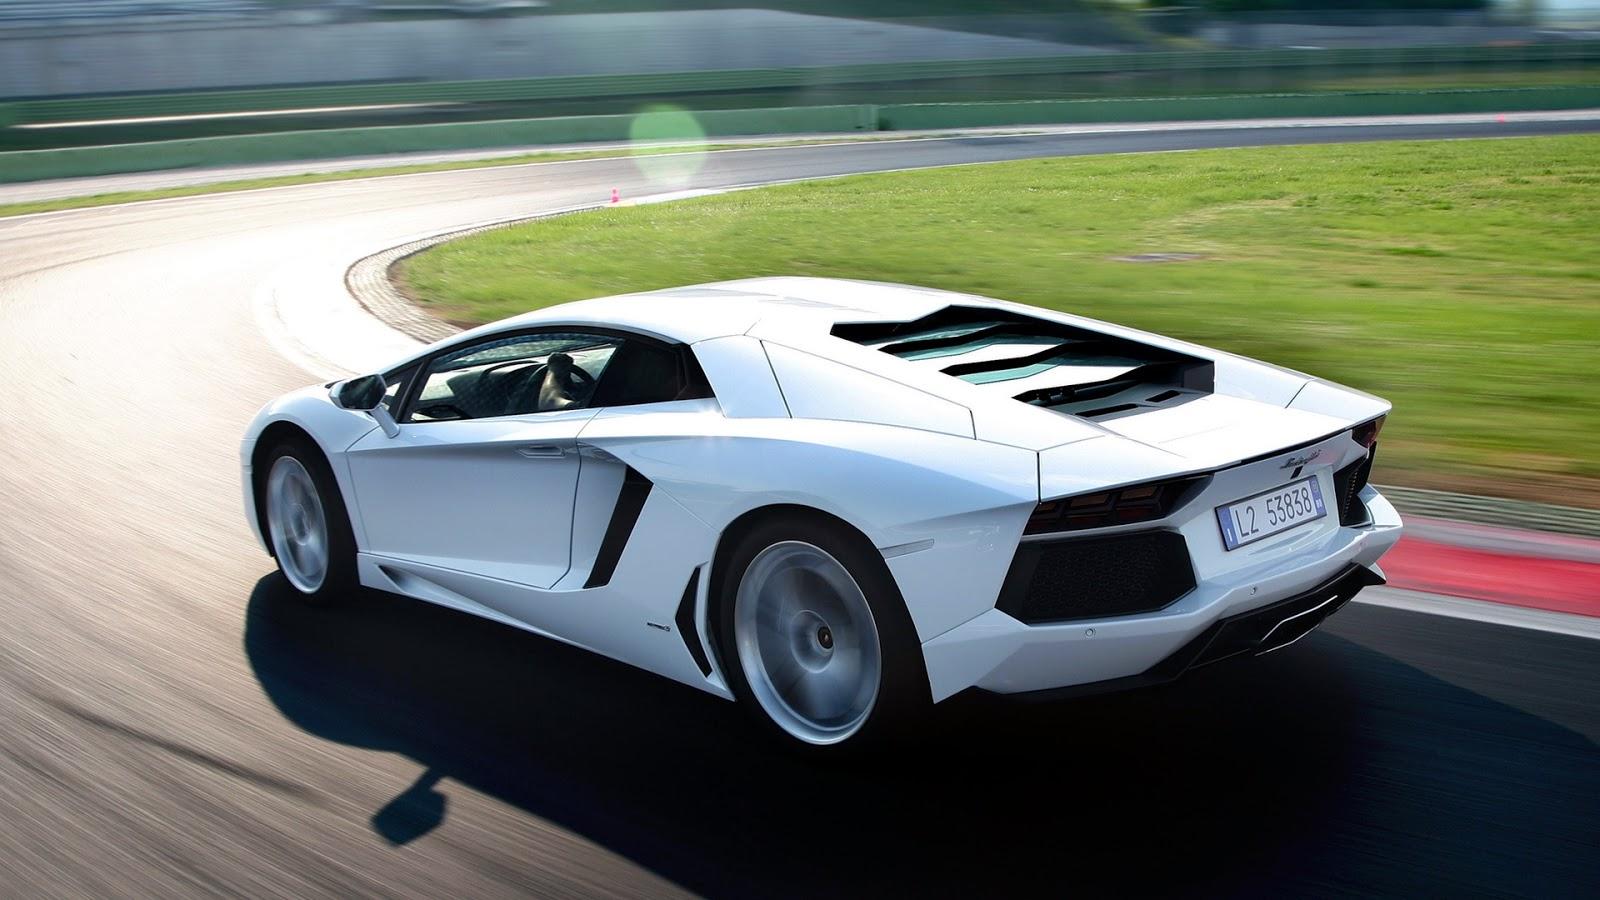 Luxury Lamborghini Cars: Lamborghini Aventador Wallpaper